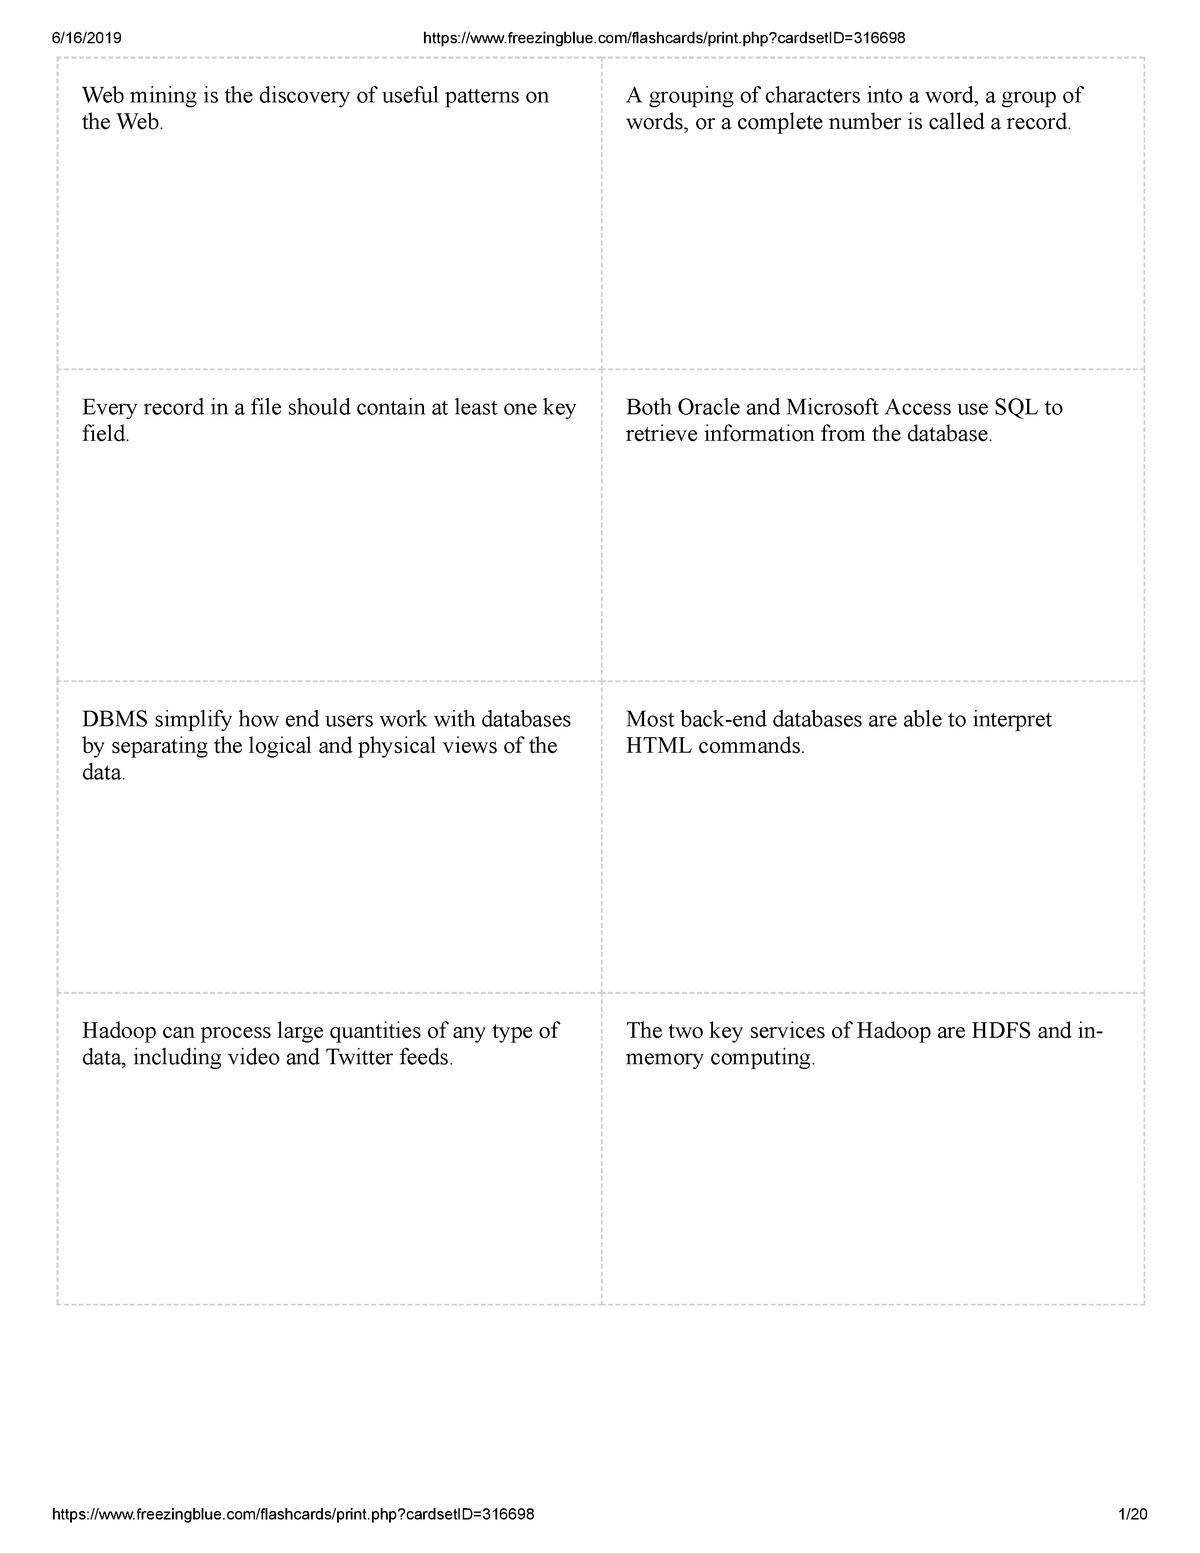 Exam 2017 - RM101: Research Methods - StuDocu